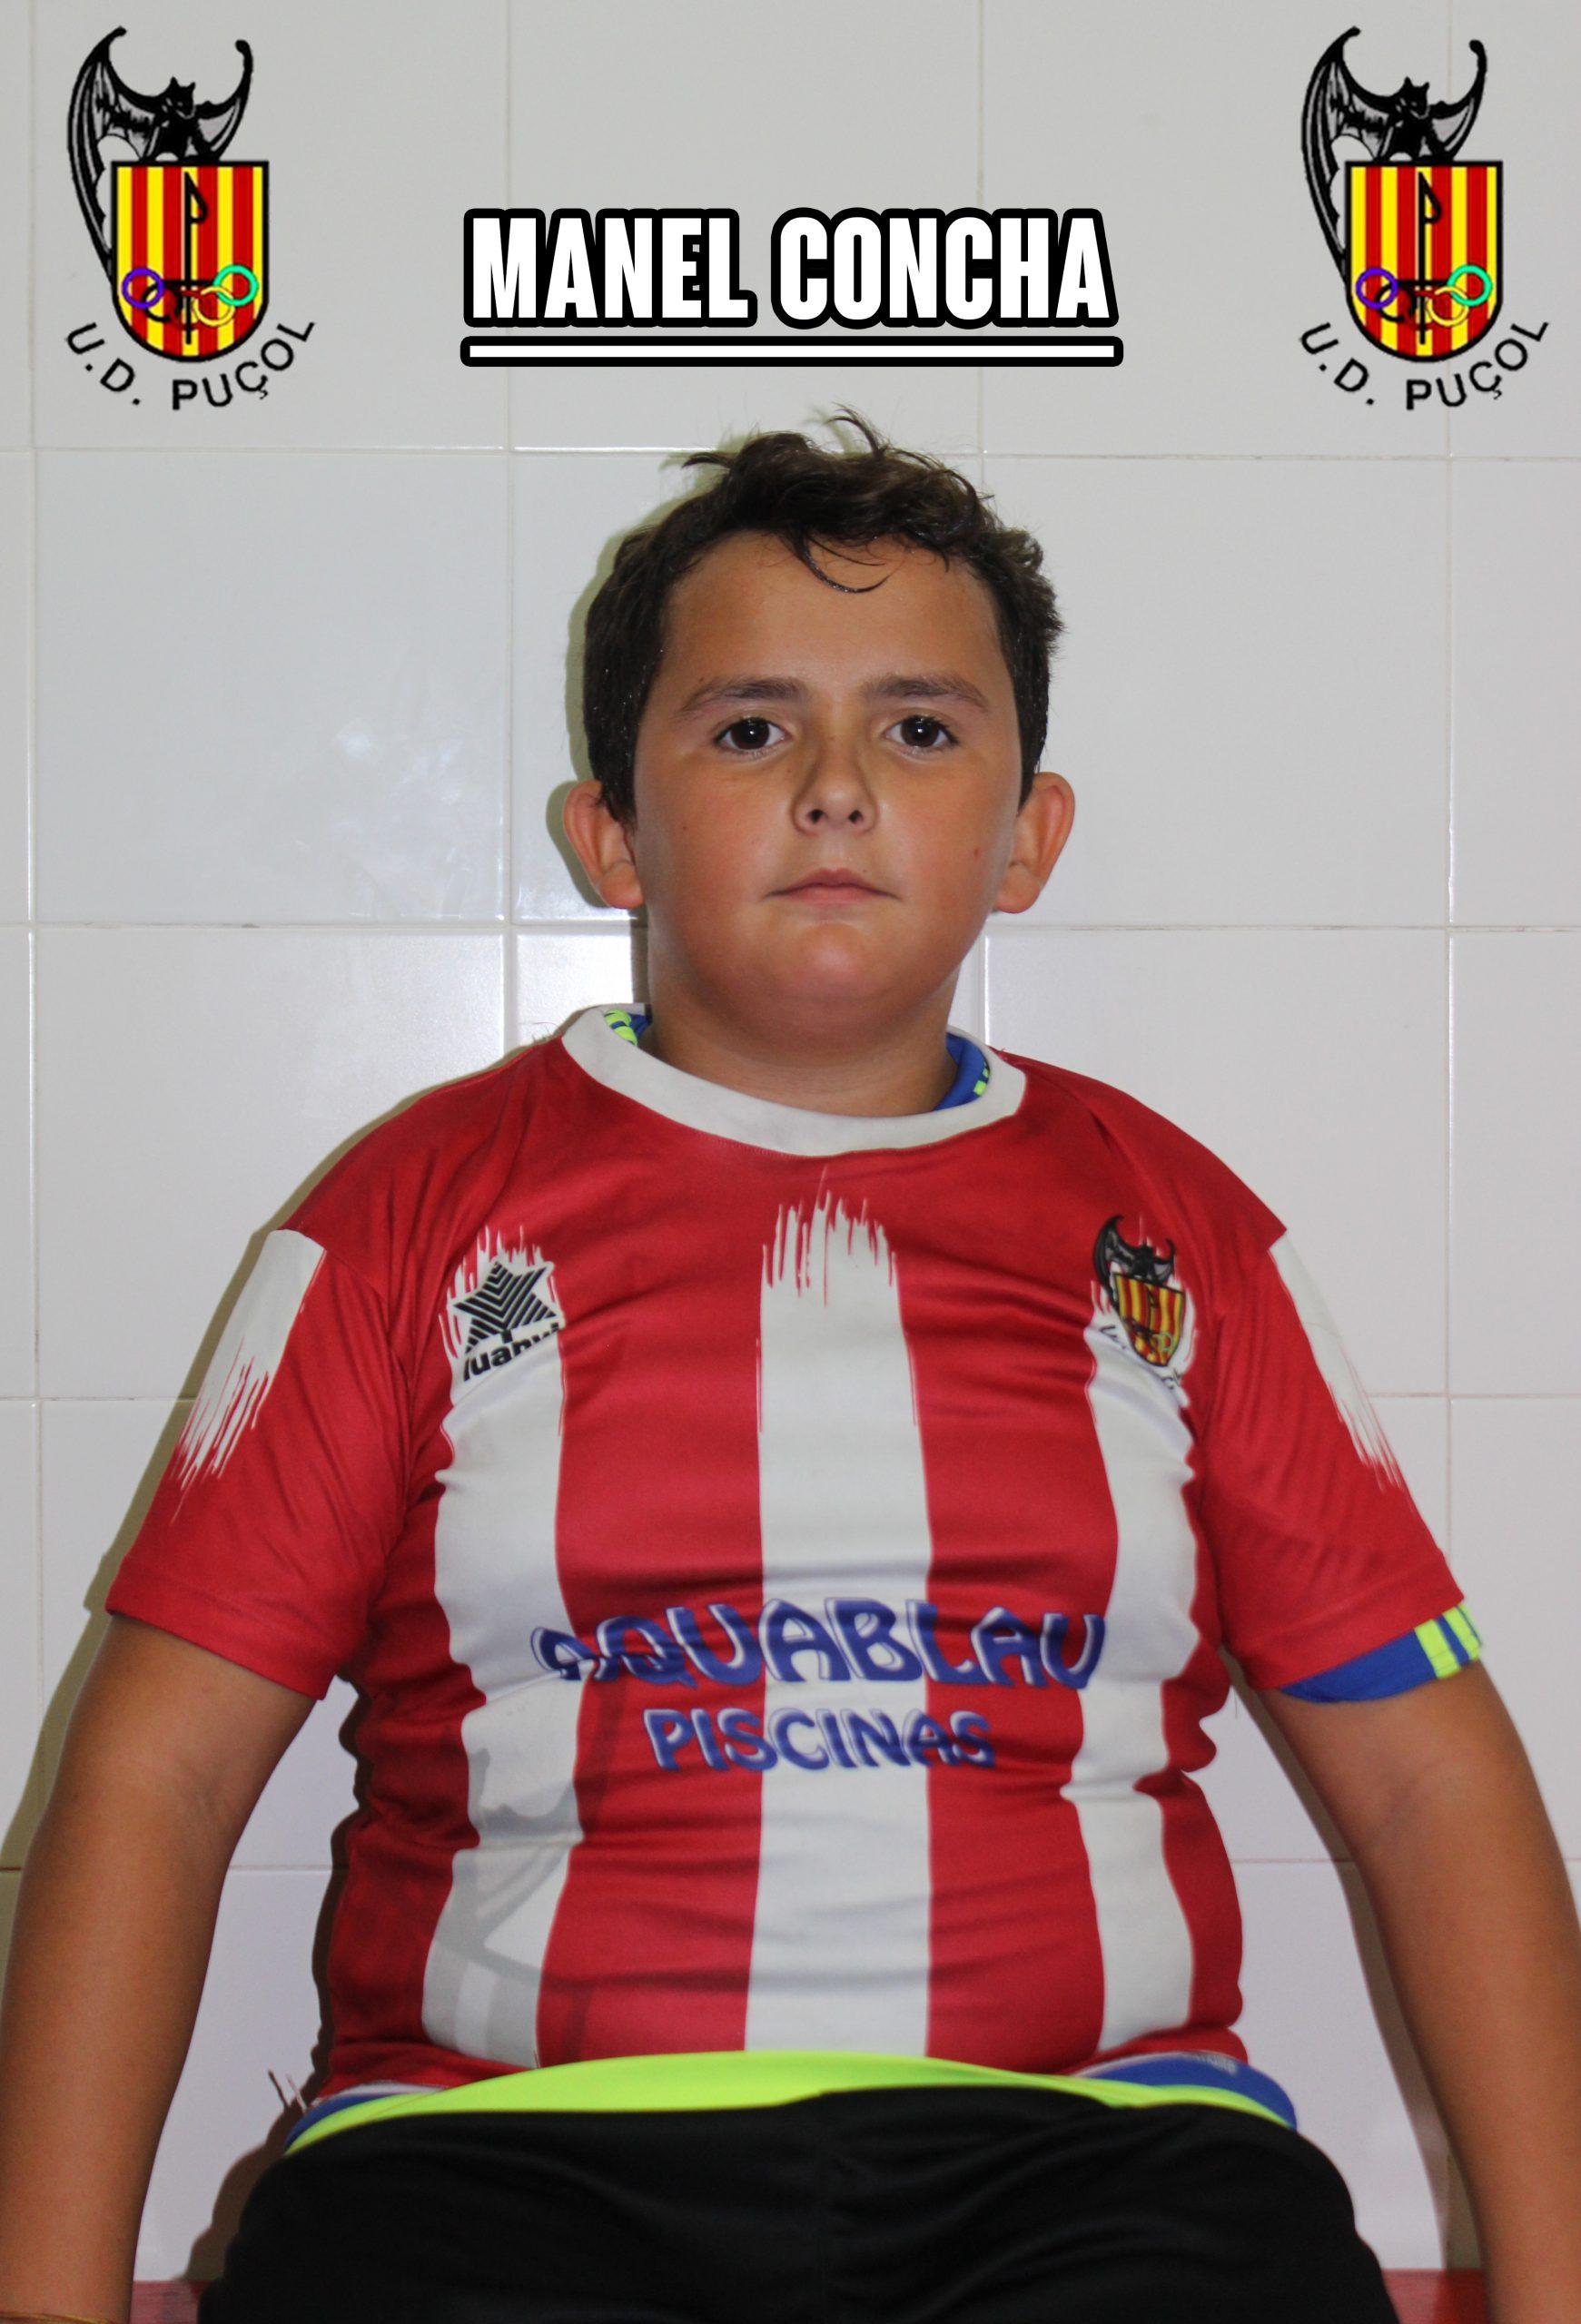 Manel Concha